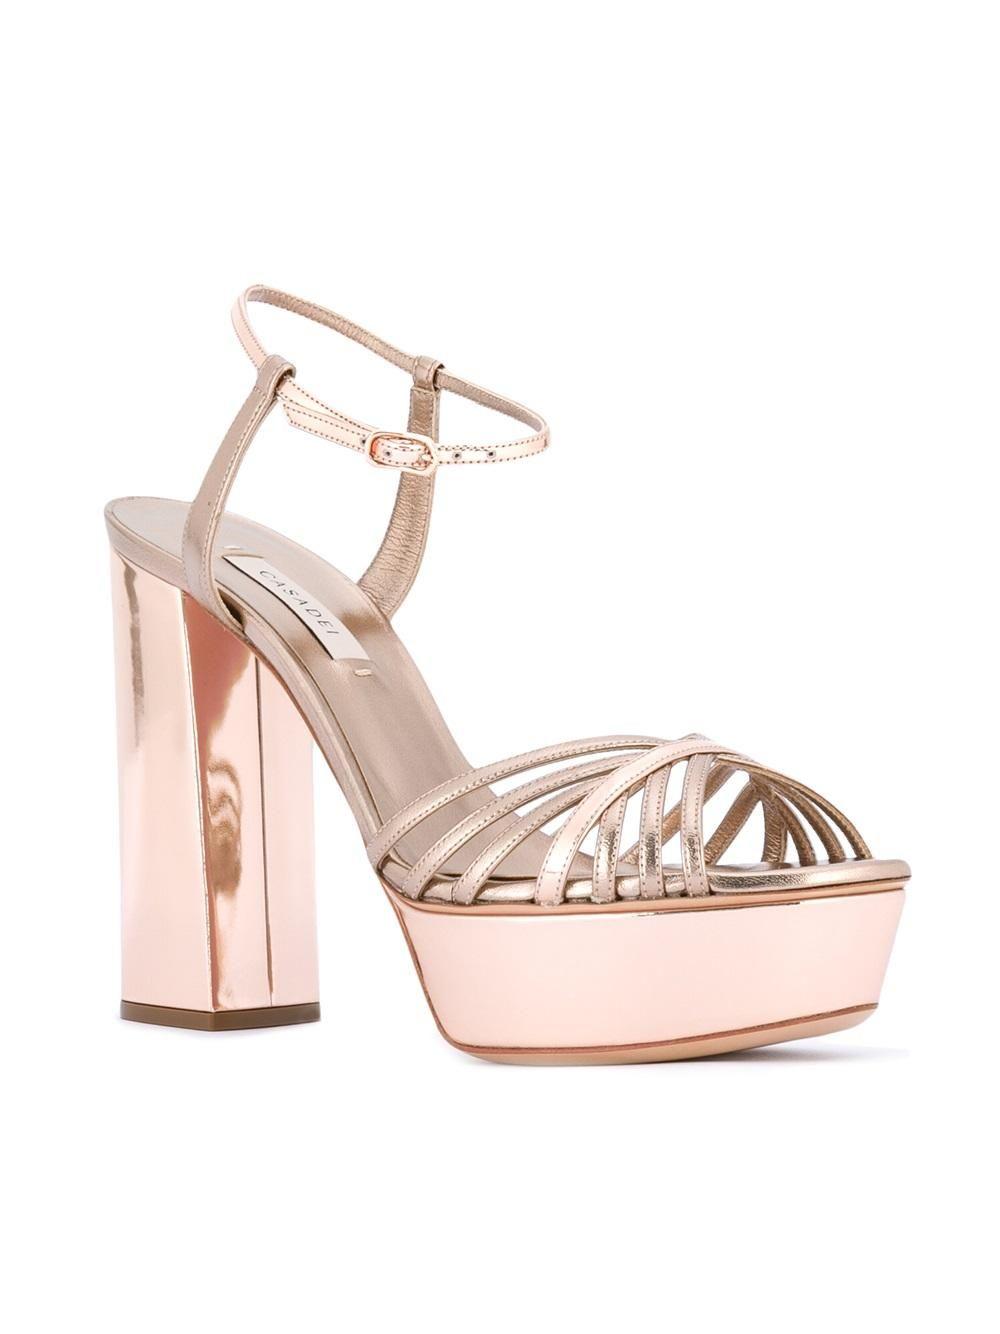 countdown package cheap price buy cheap big sale Casadei Metallic Platform Sandals discount fashionable outlet professional Cfhmgf535